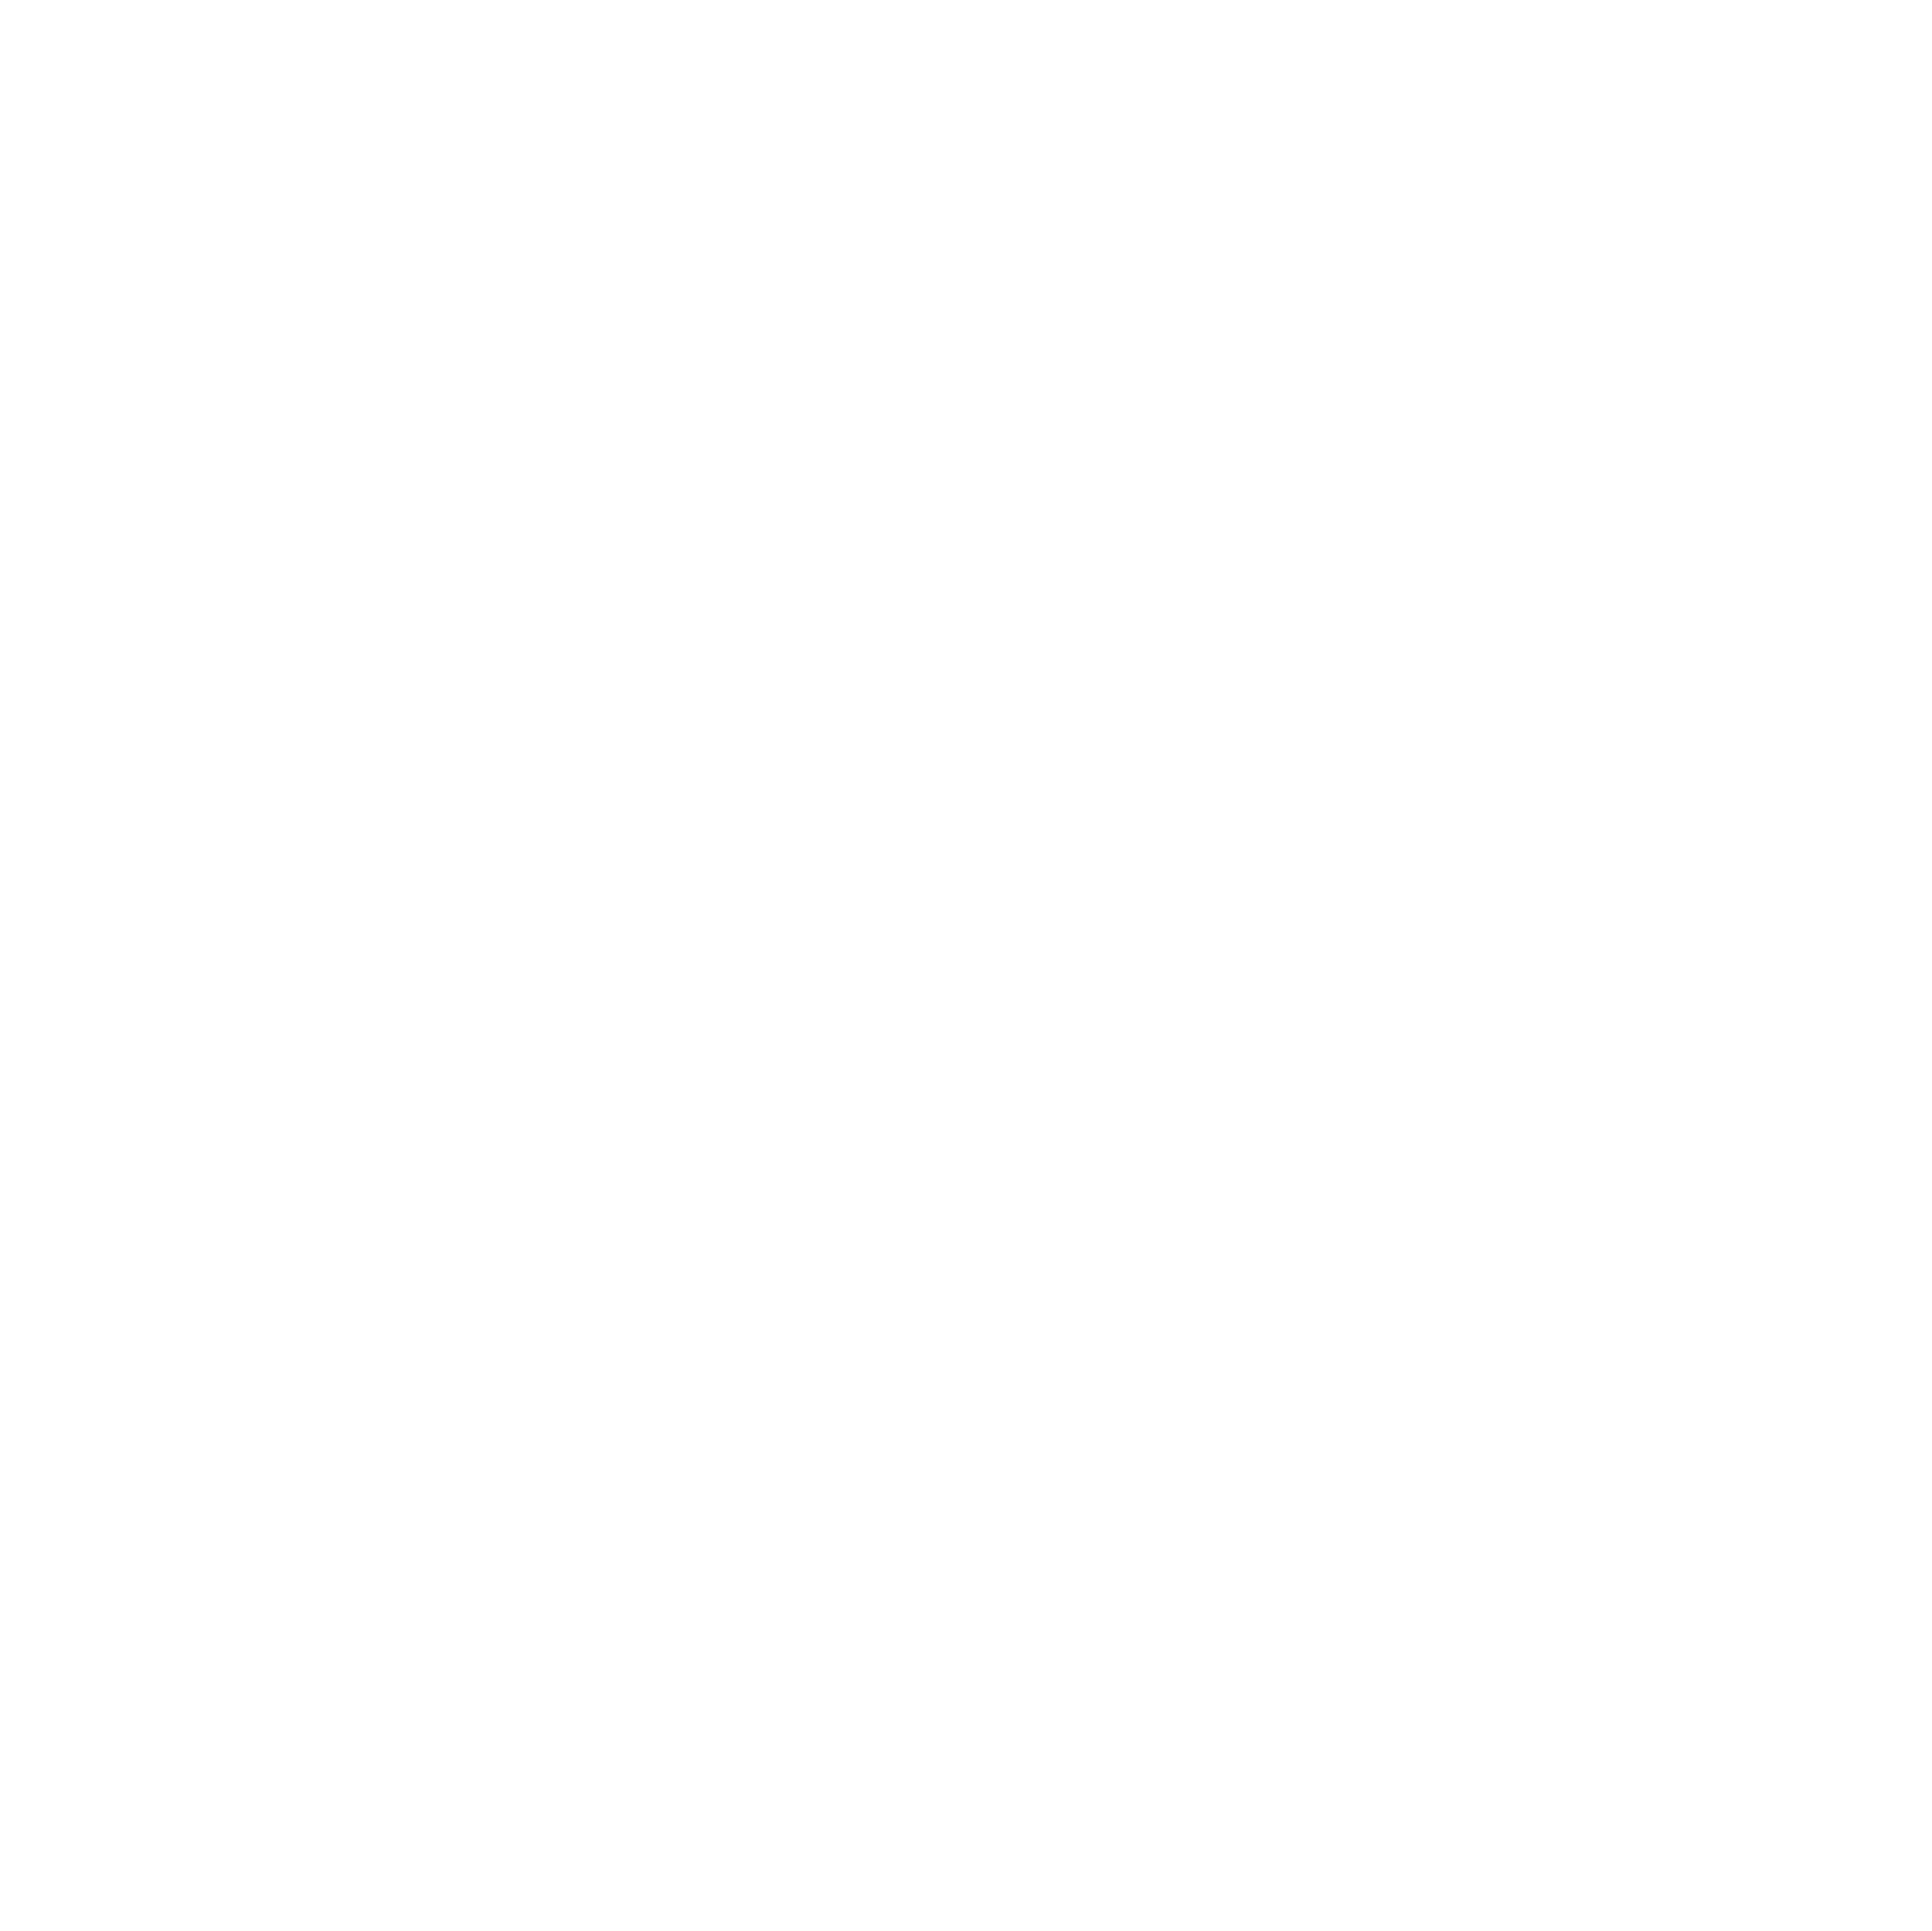 Heidi Dunstan